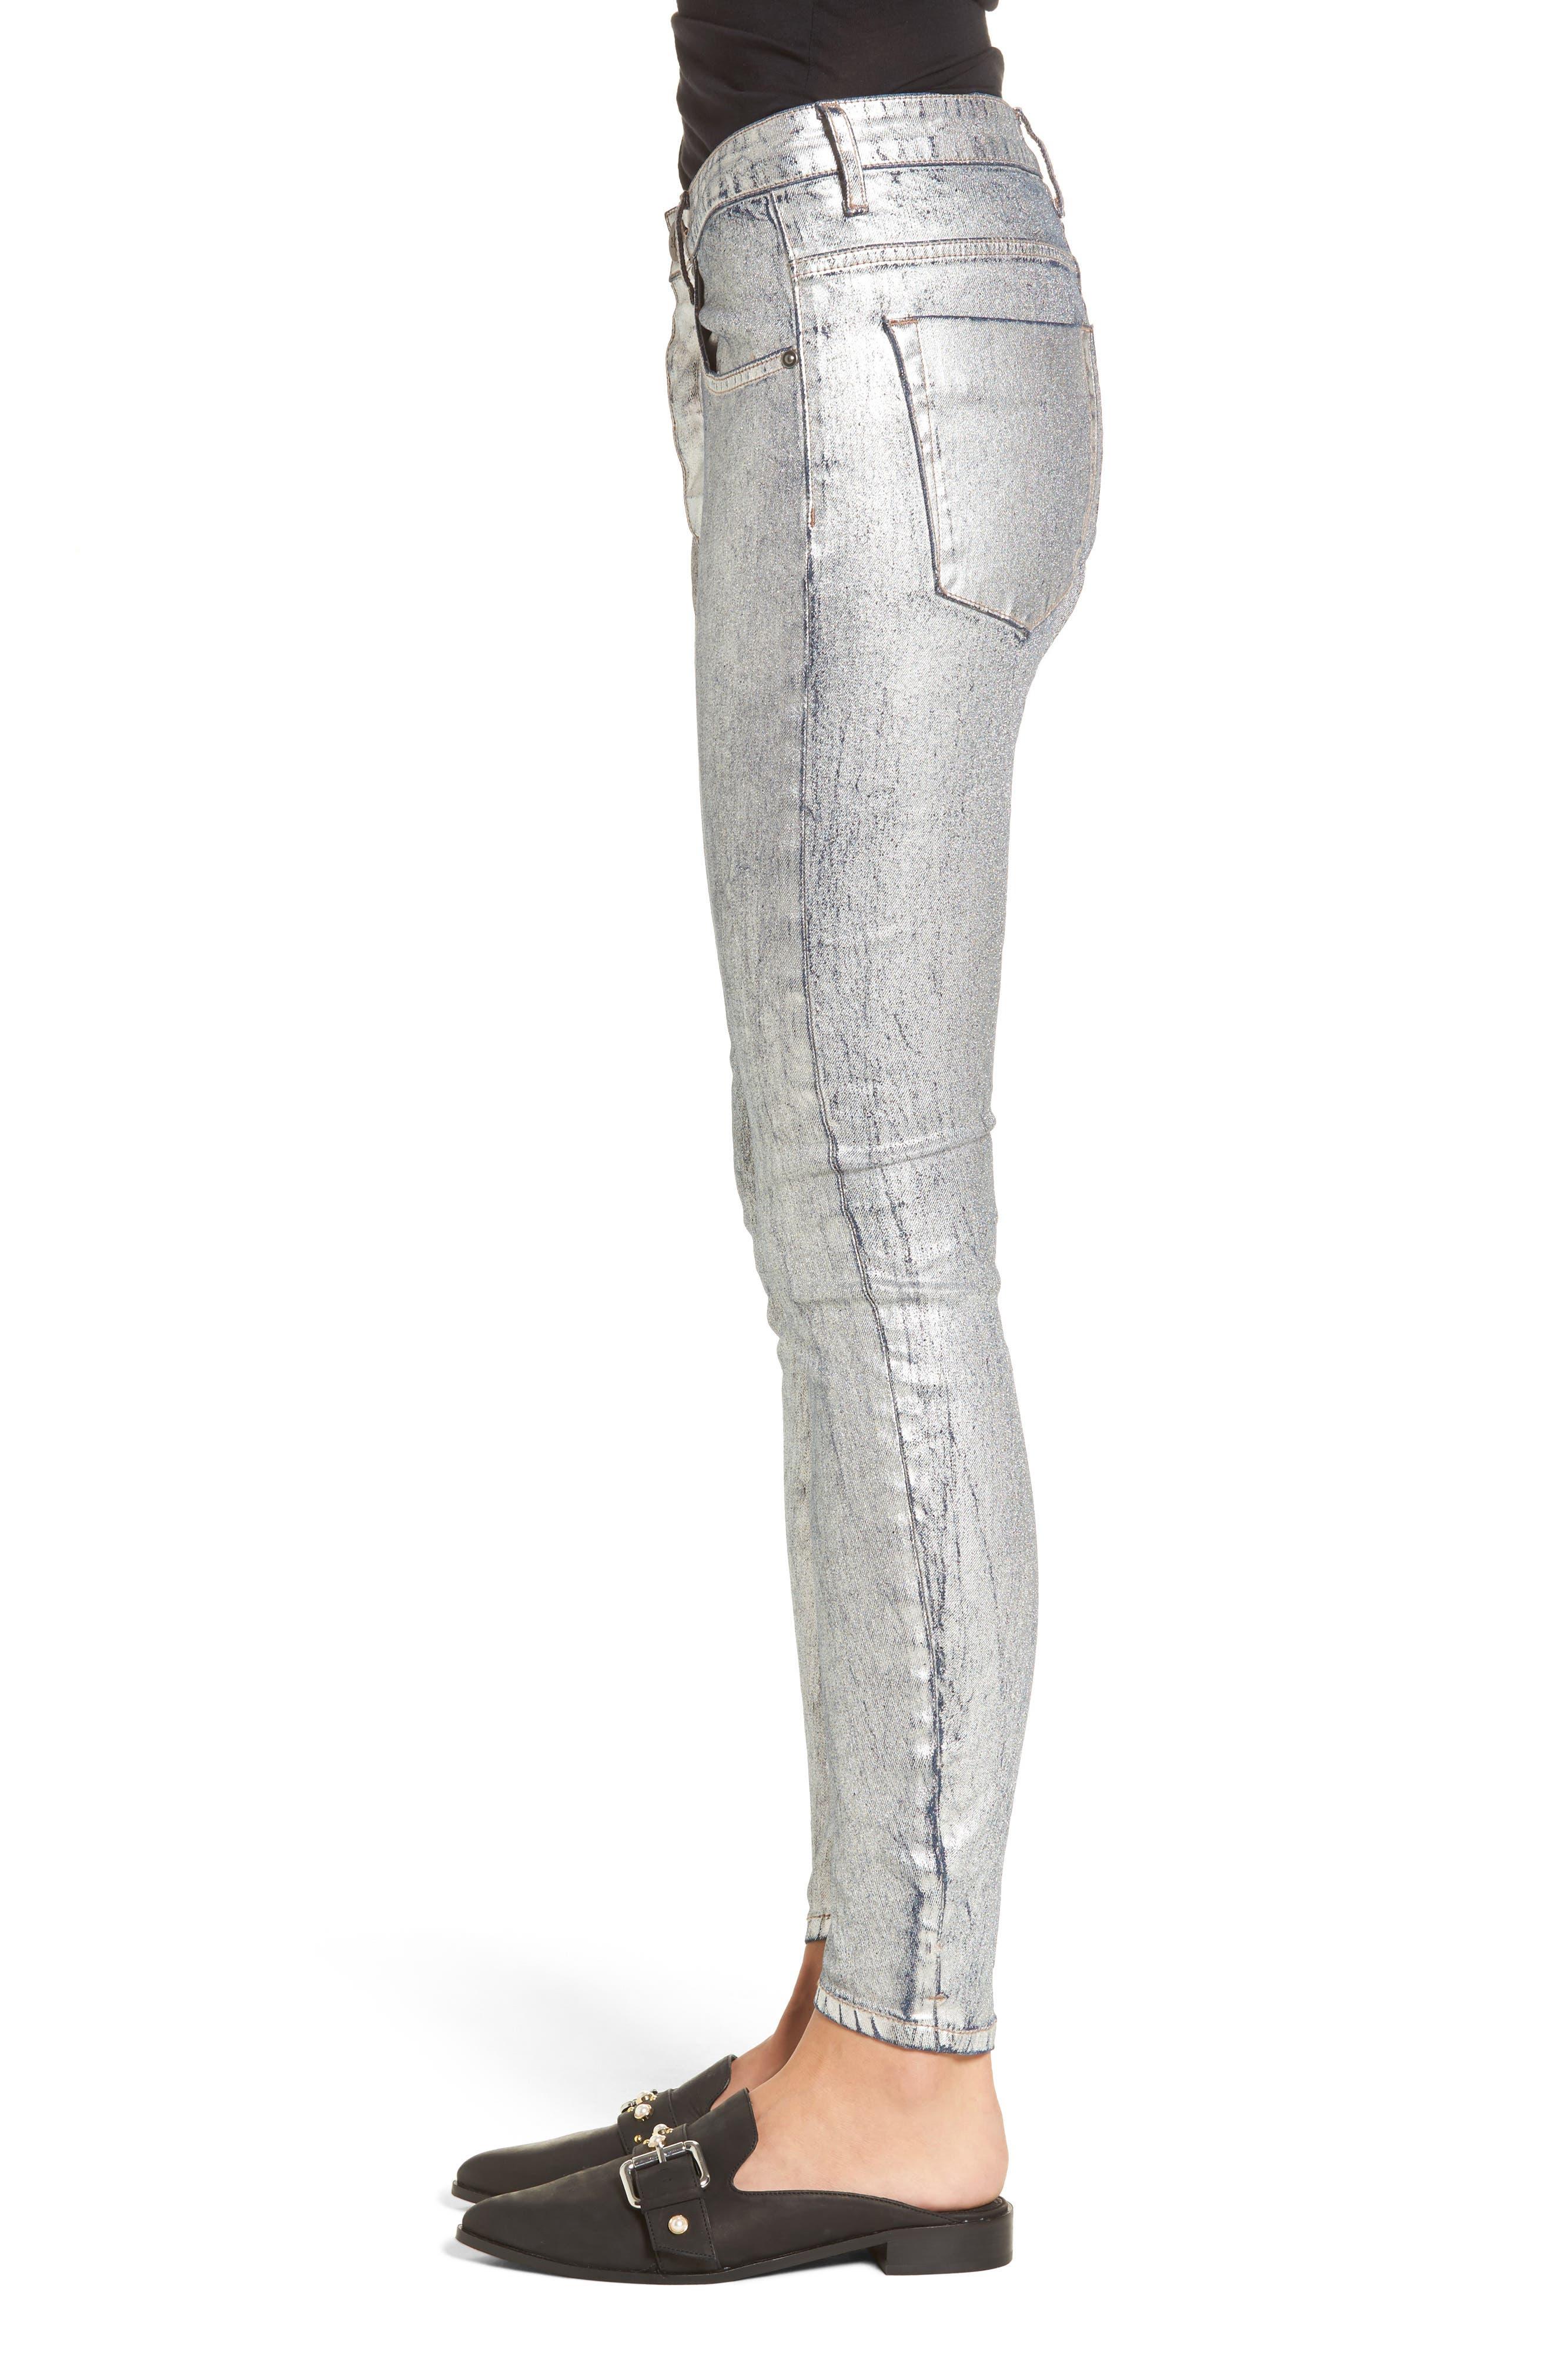 Kidds Metallic Drop Crotch Skinny Jeans,                             Alternate thumbnail 3, color,                             Nightshade